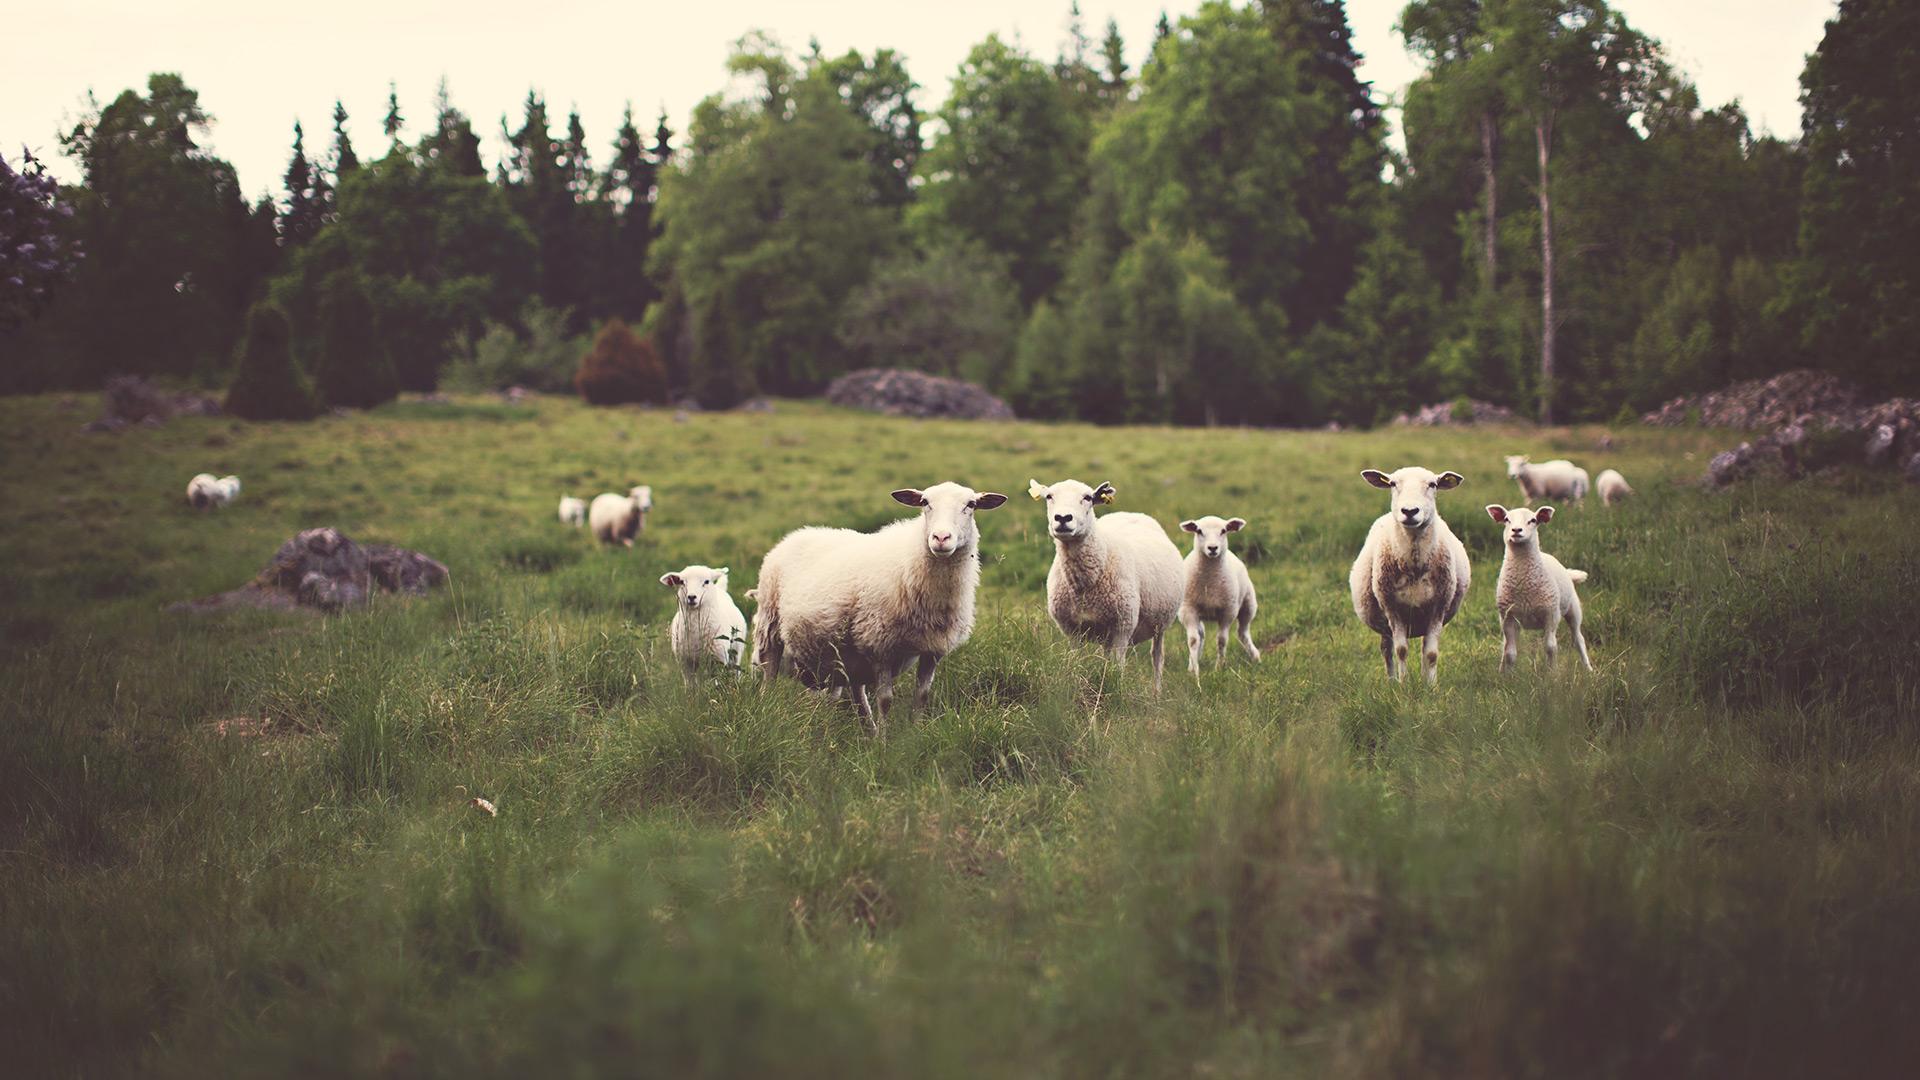 In A Farm